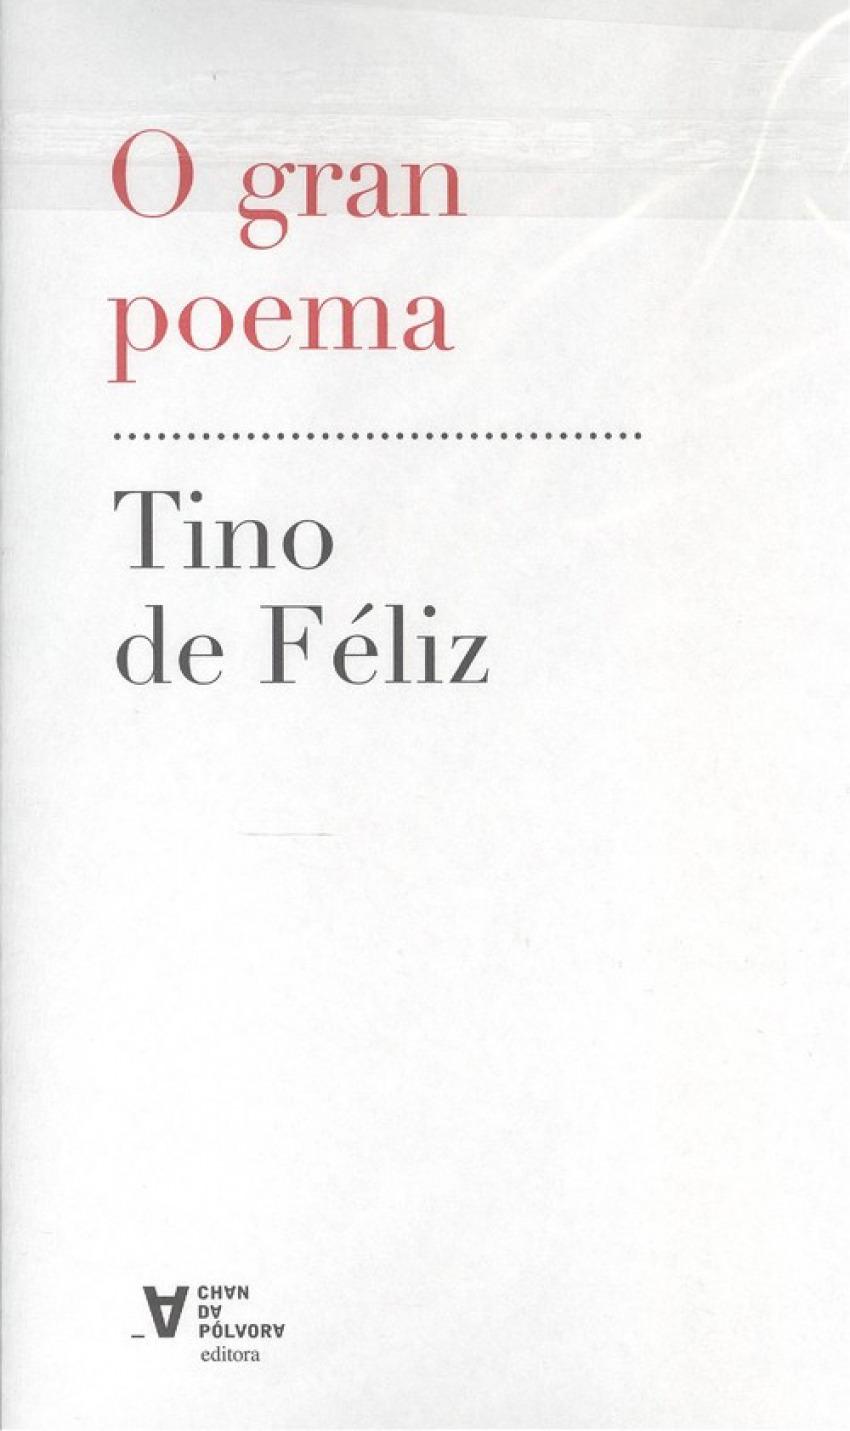 (g).o gran poema